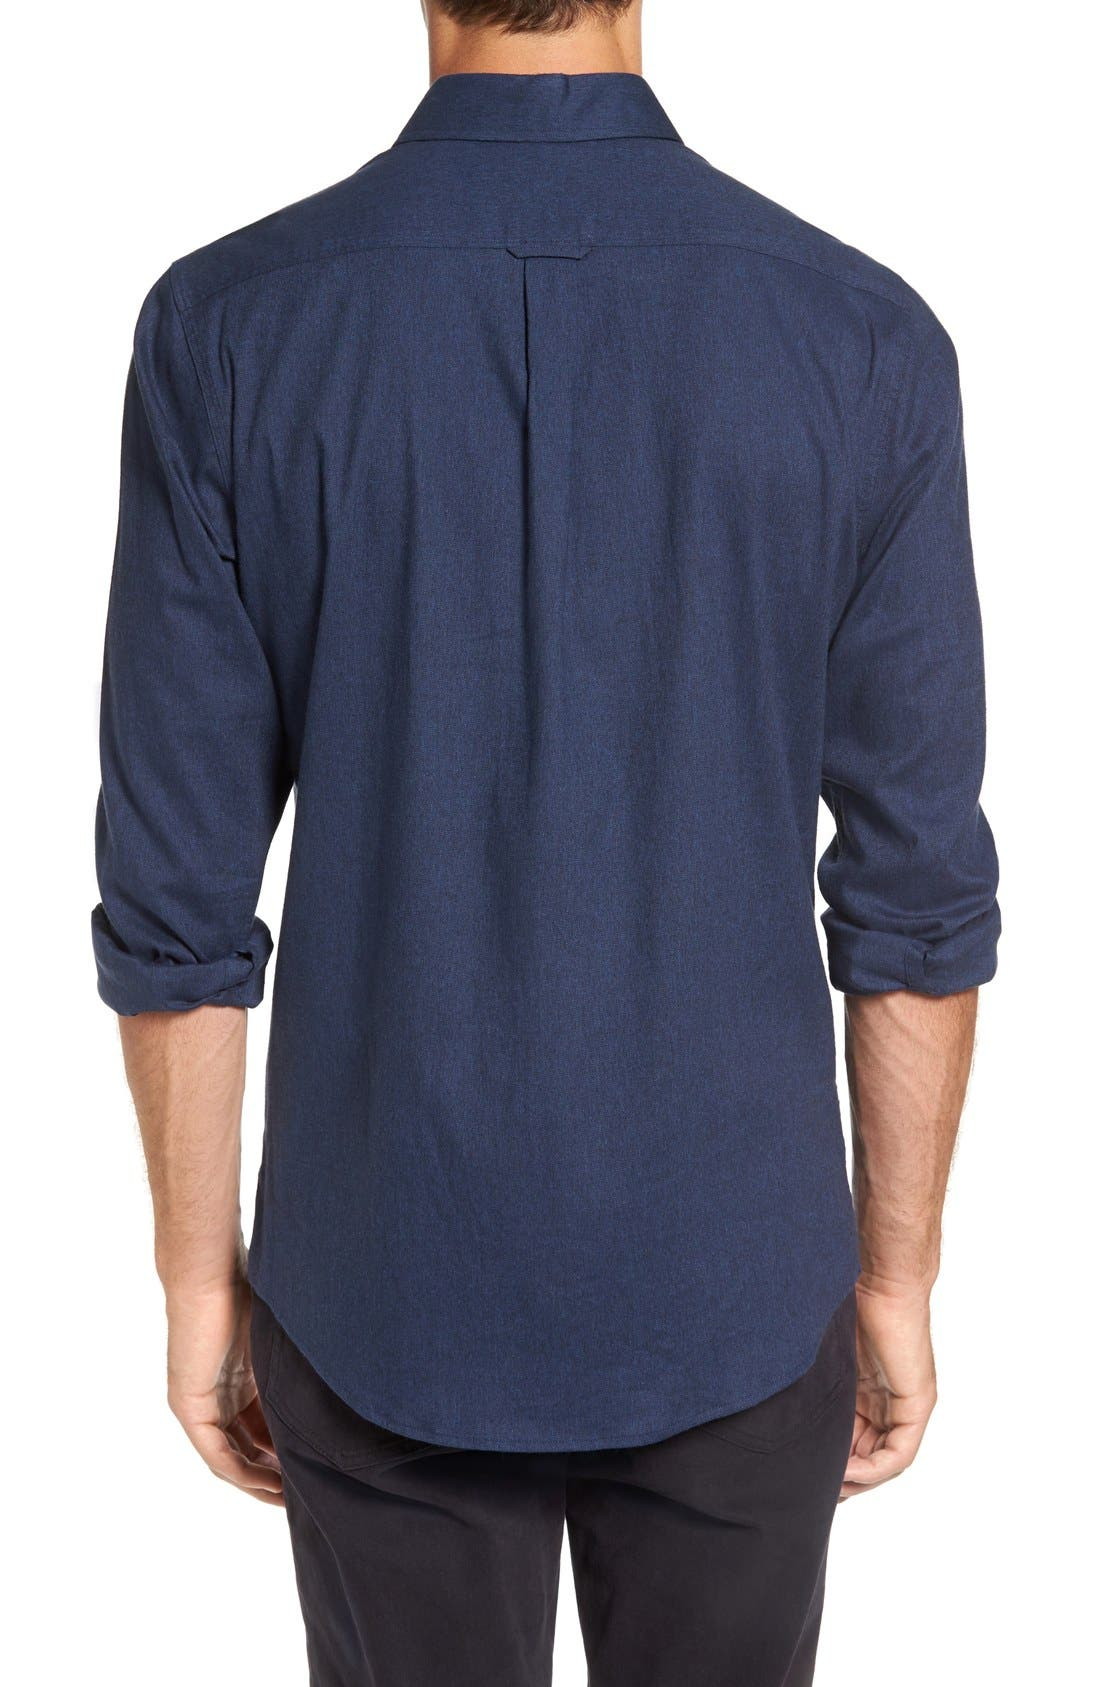 'Sinclair' Trim Fit Brushed Twill Sport Shirt,                             Alternate thumbnail 2, color,                             Indigo